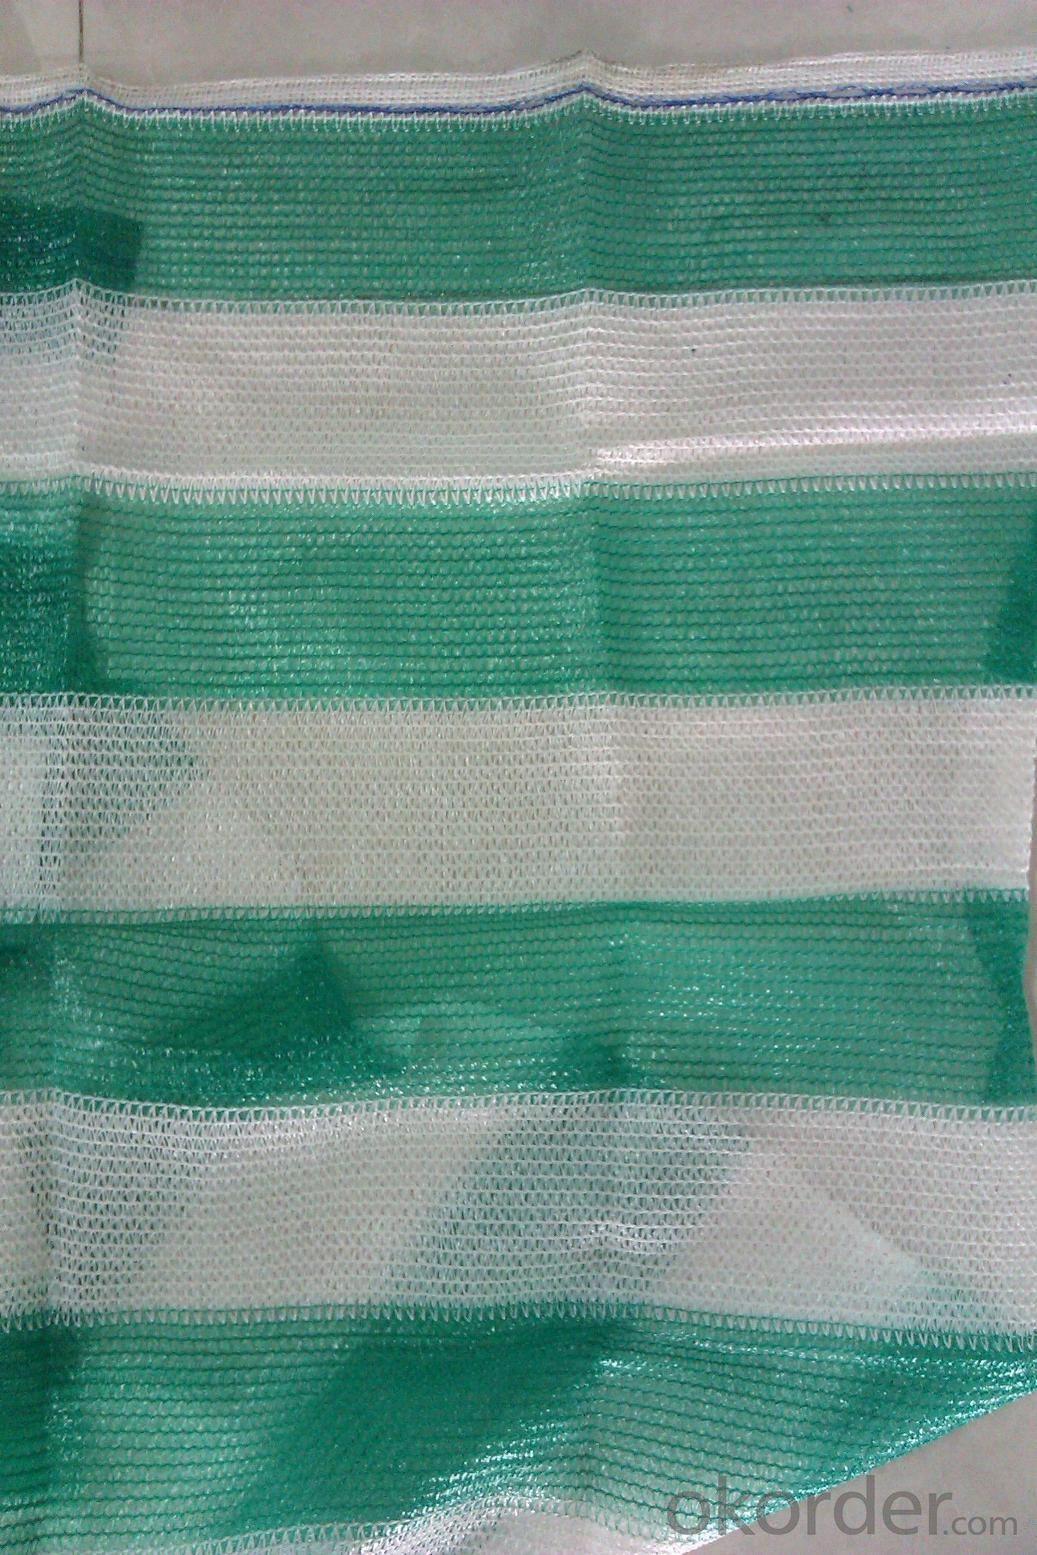 100% VIRGIN HDPE SUNSHADE SHADE NET Shading Net